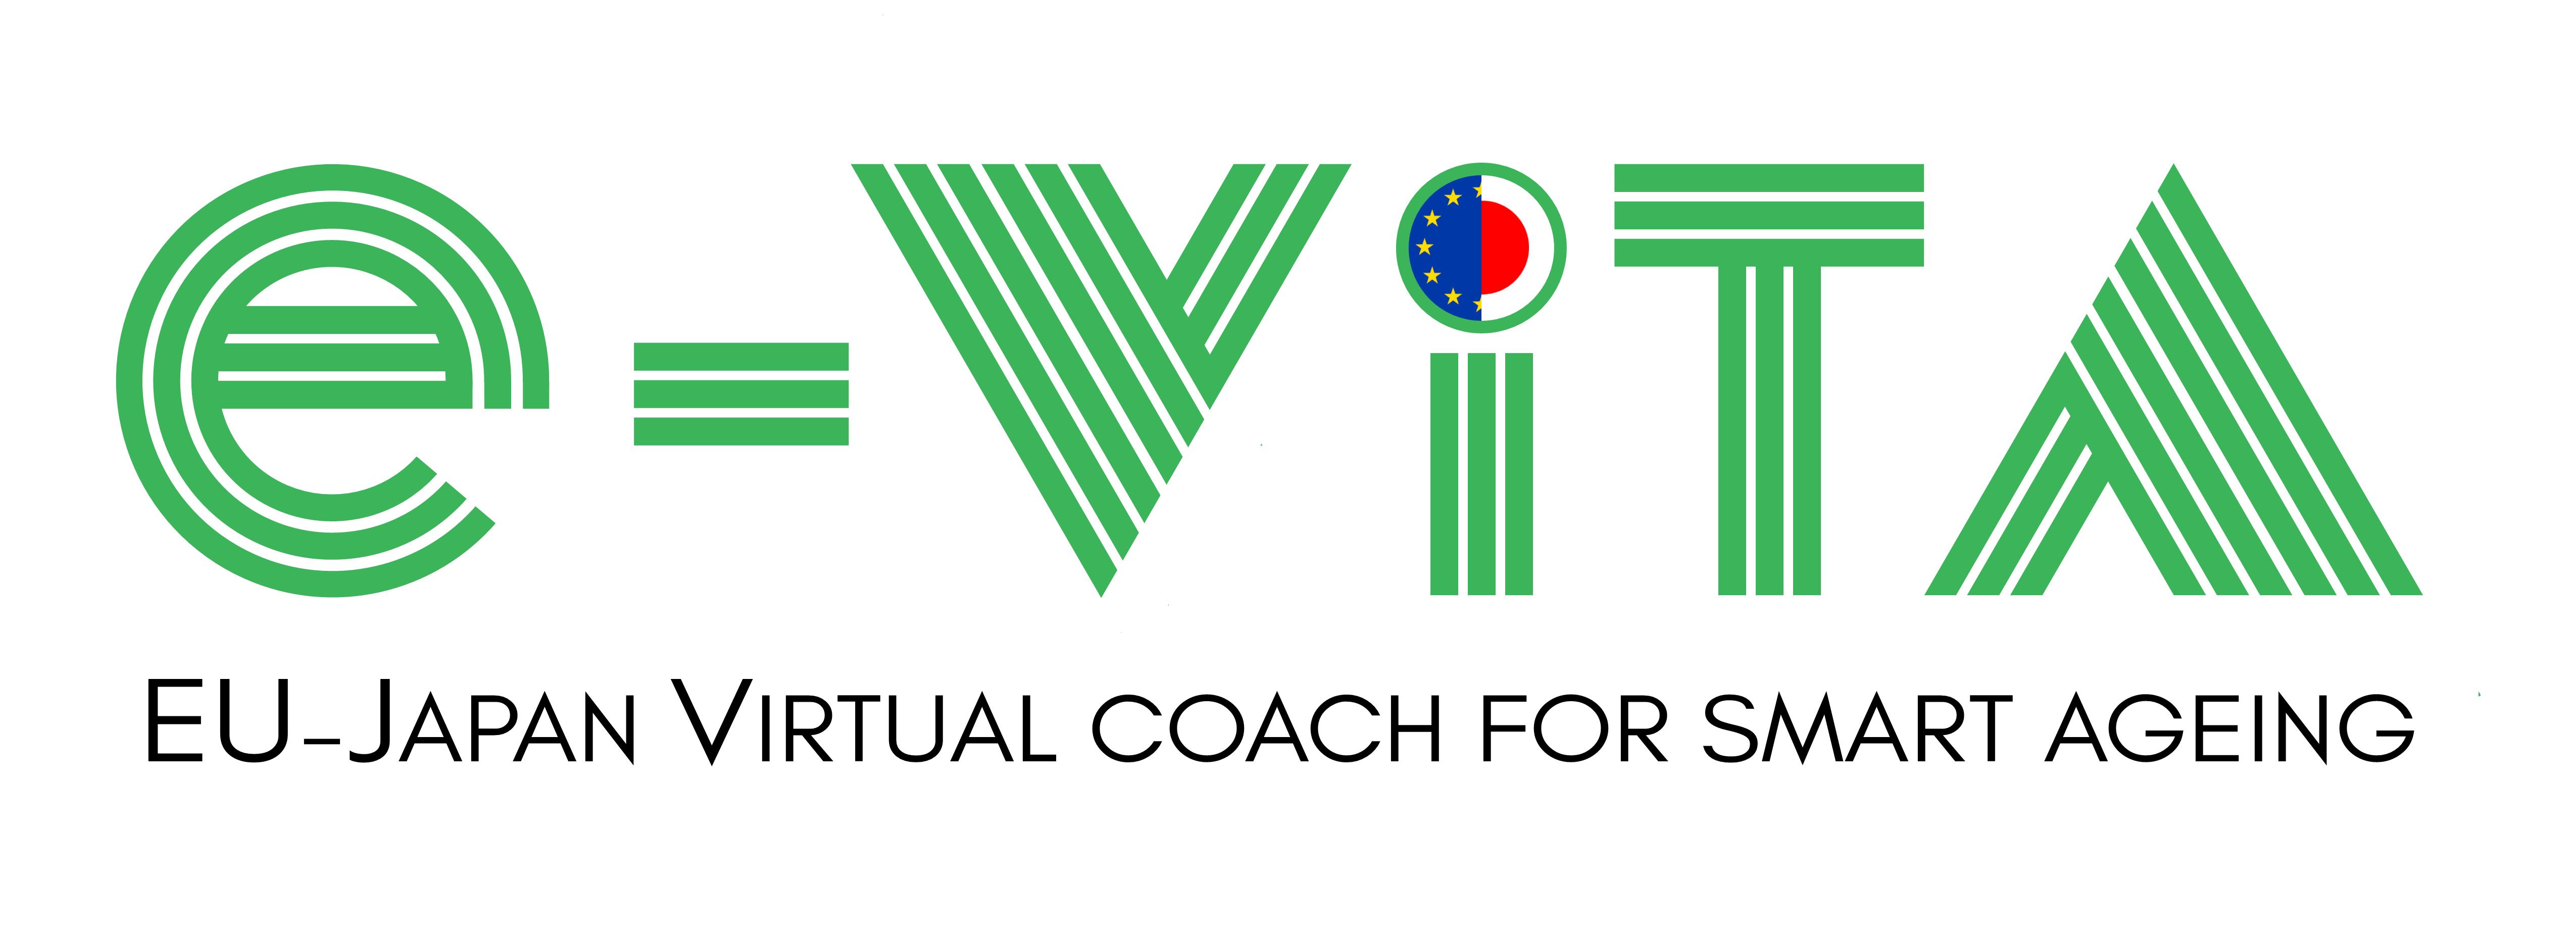 e-VITA Virtual coach